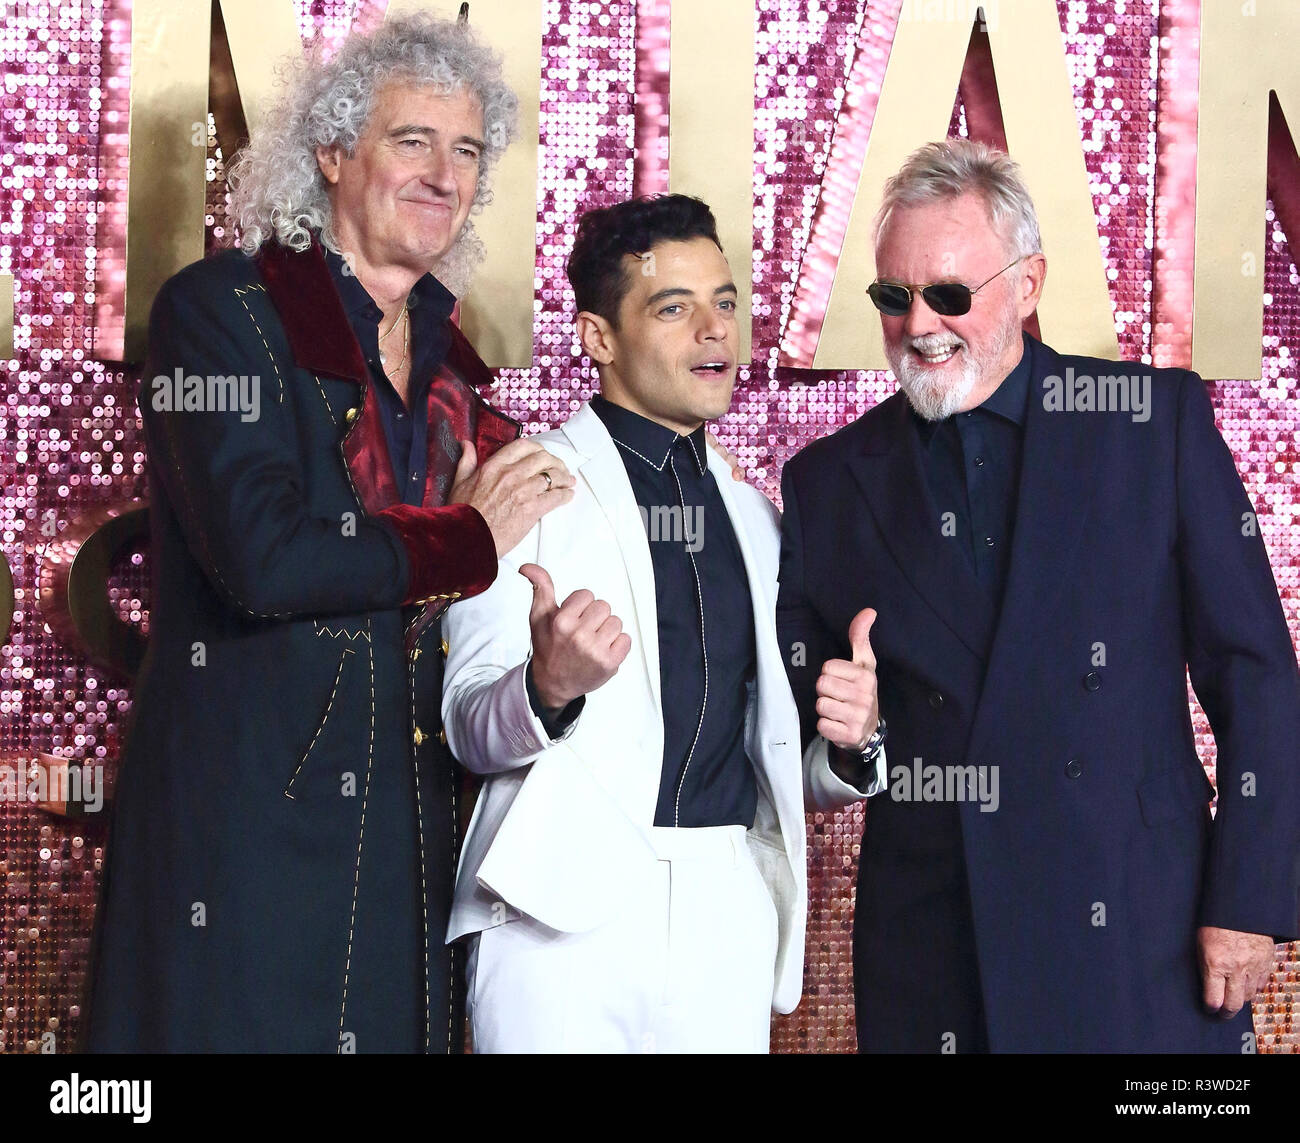 Bohemian Rhapsody UK Premiere auf der SSE Arena Wembley, London Mit: Brian May, Rami Malek, Roger Taylor Wo: London, Großbritannien Wann: 23.Okt 2018 Credit: WENN.com Stockfoto